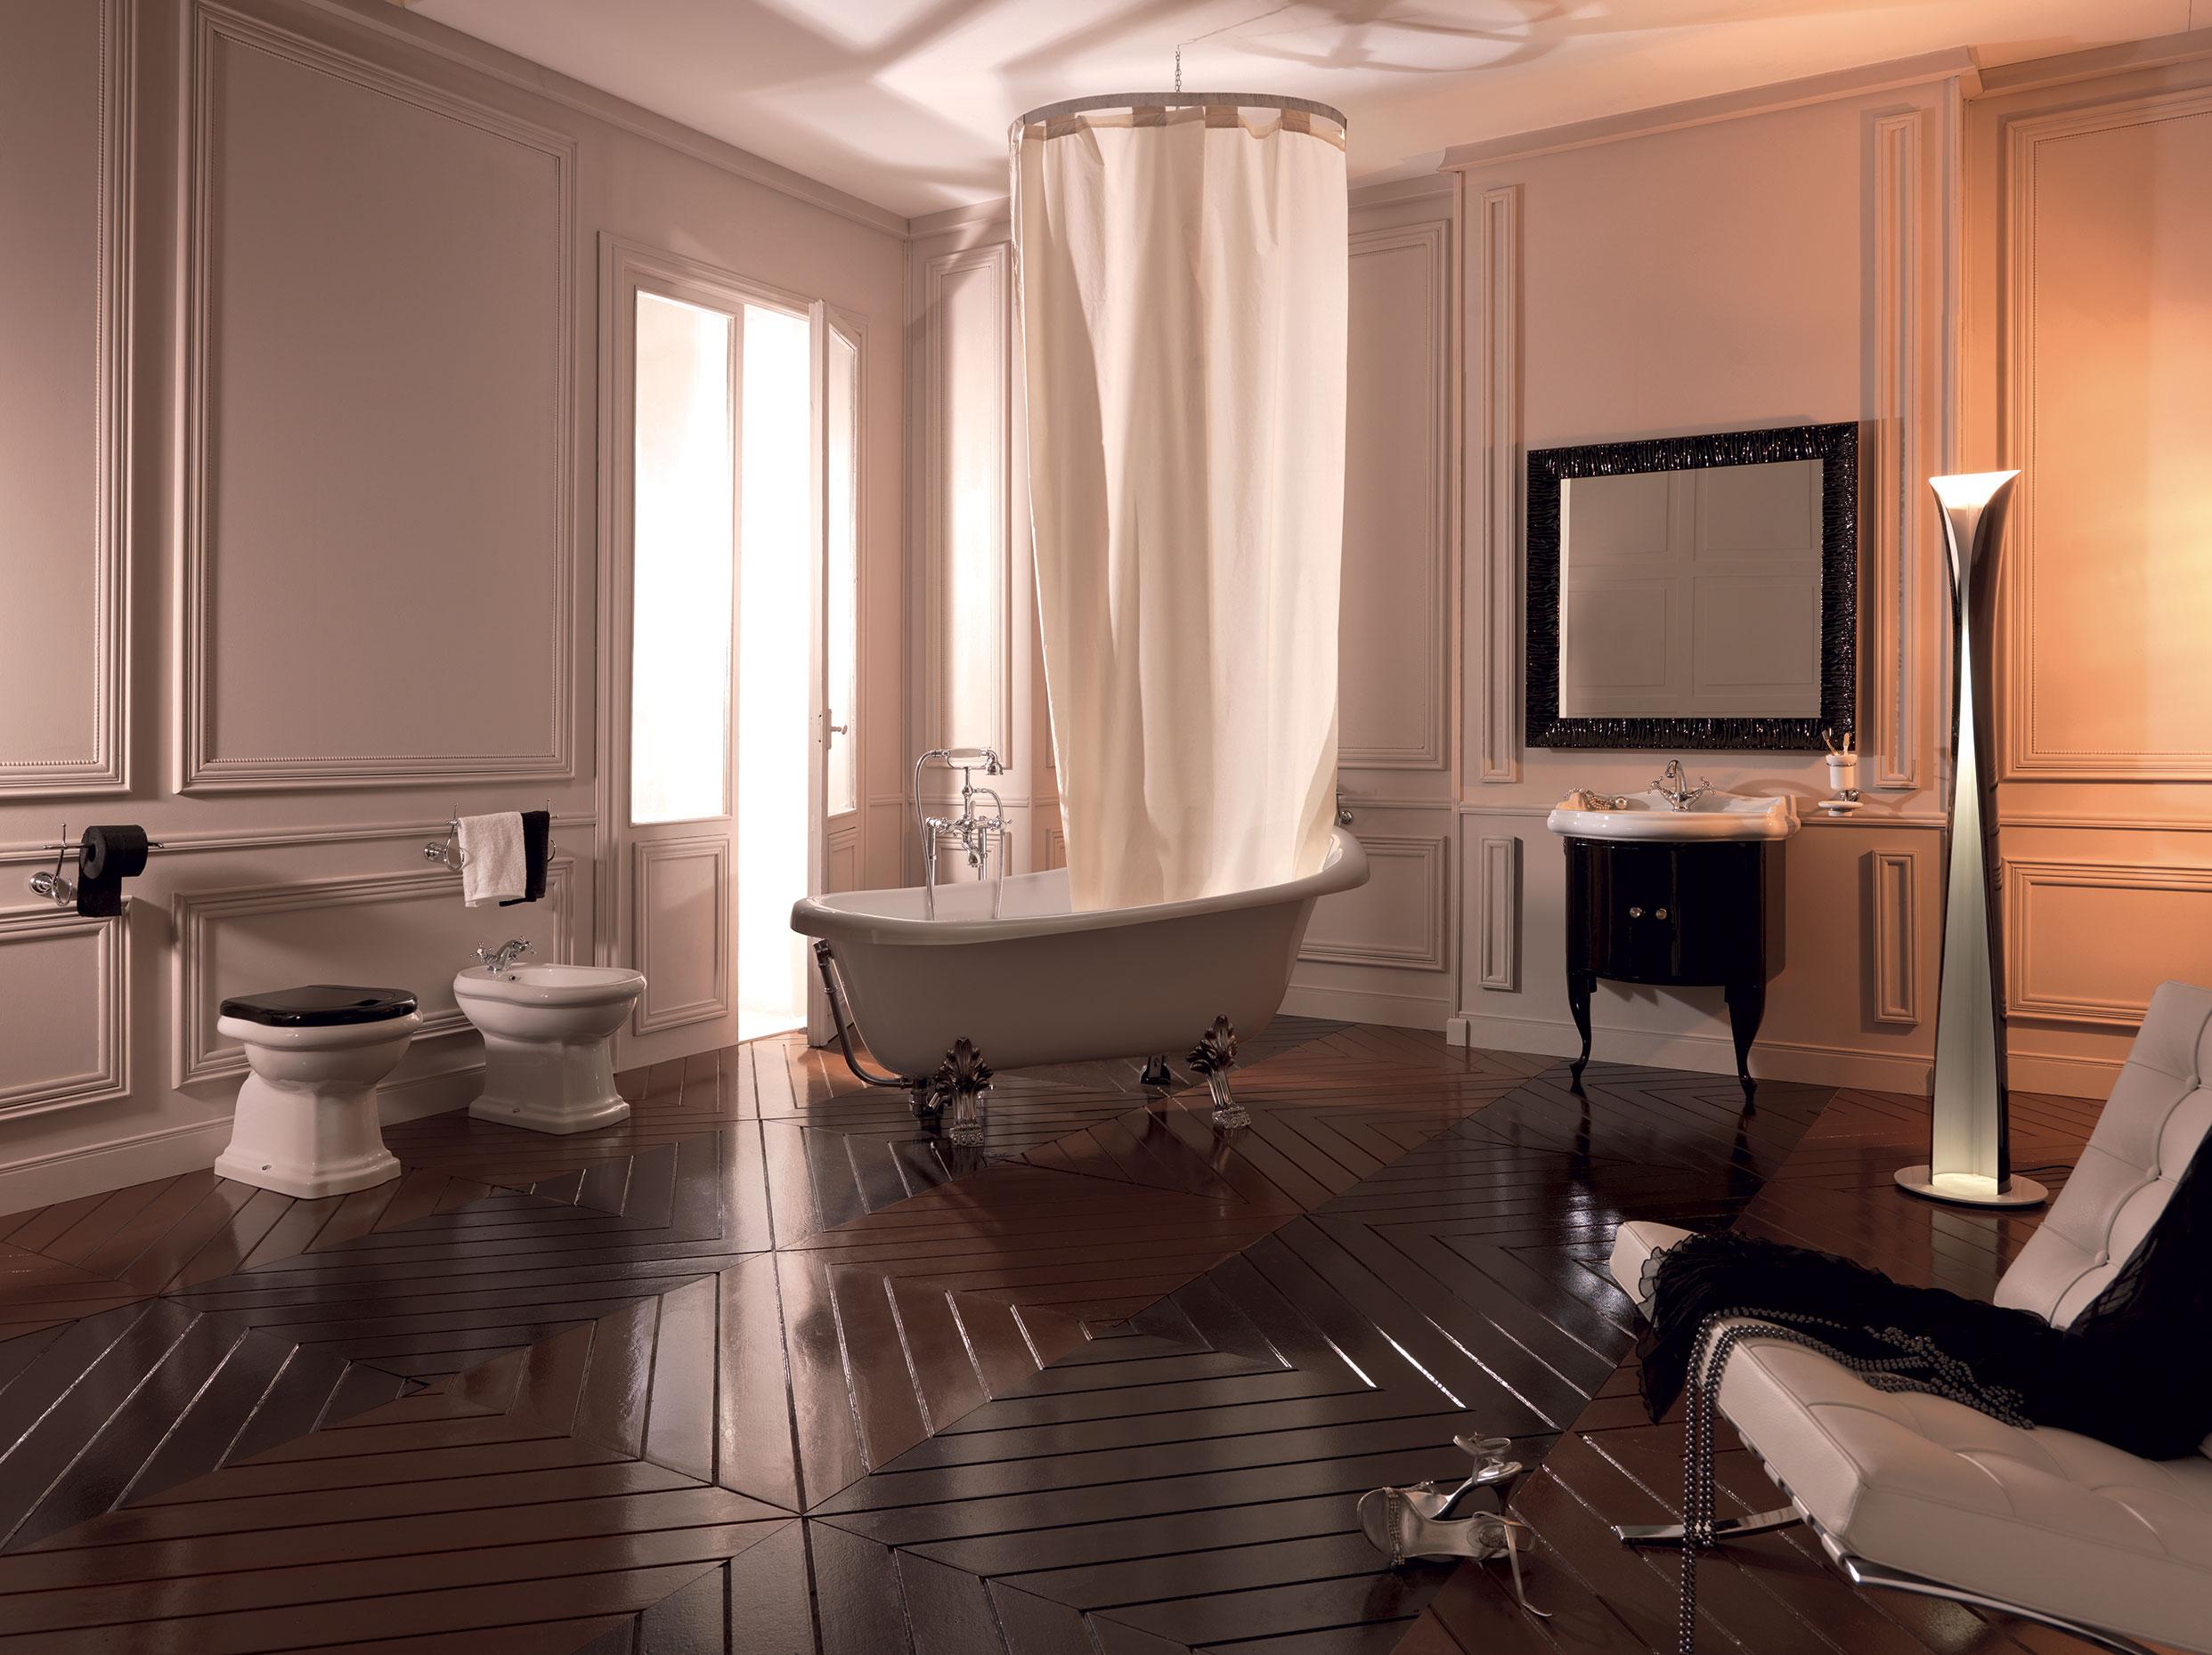 Vasca Da Bagno Kerasan : Vasca da bagno bianca